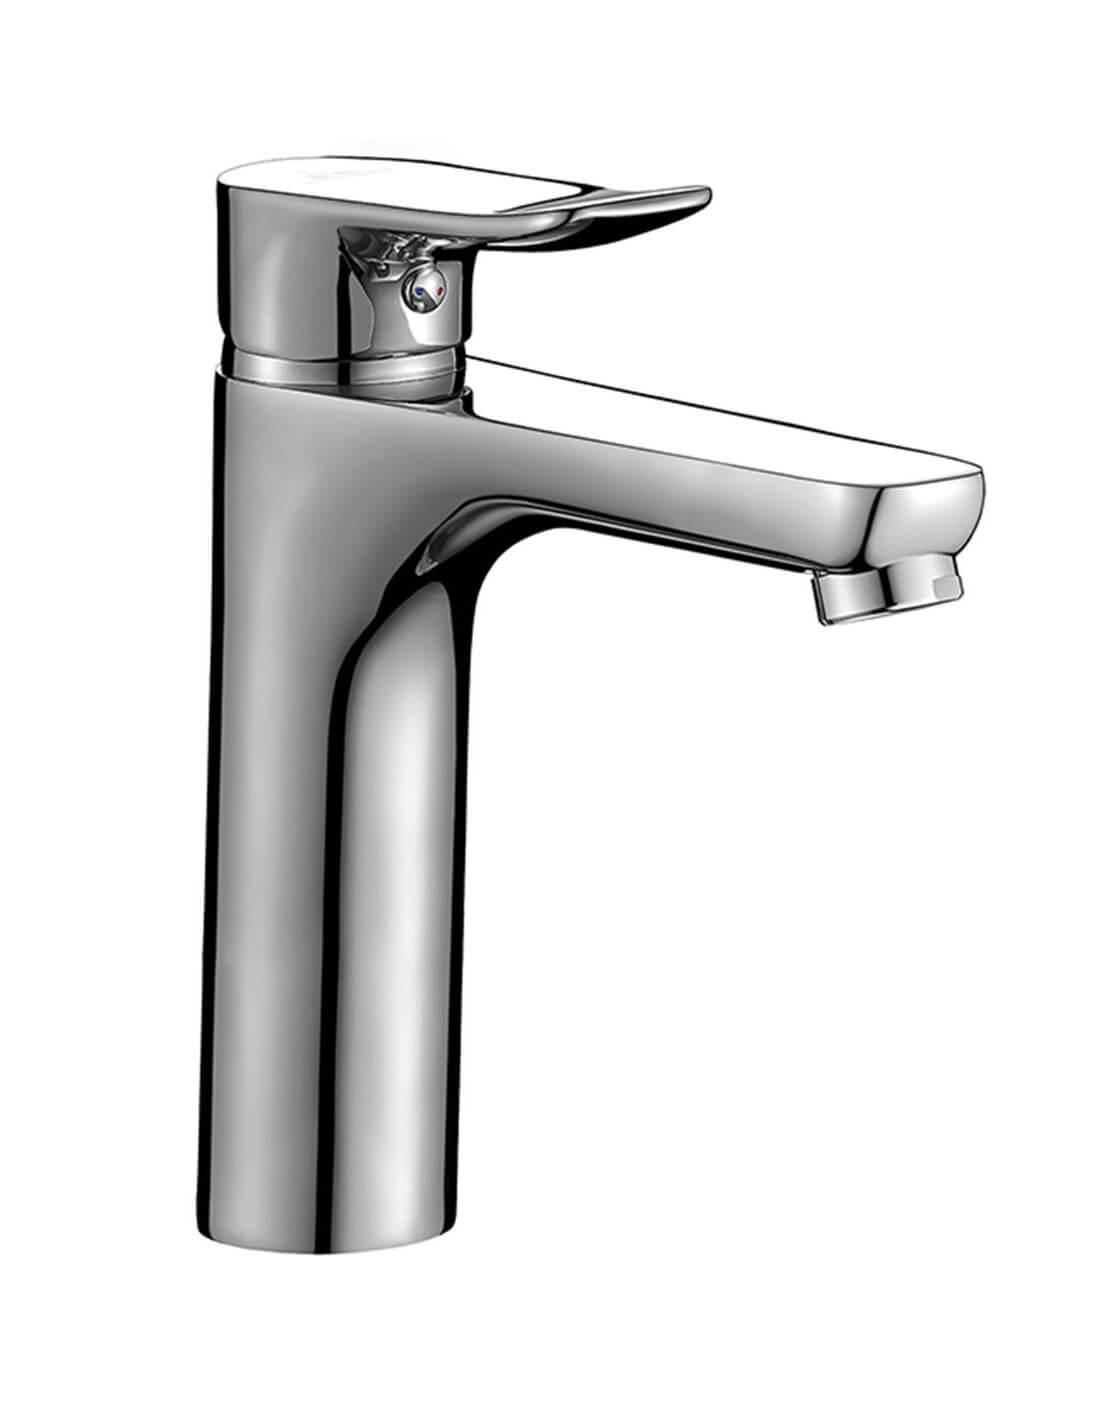 Grifo de lavabo con caño alto de Aquassent